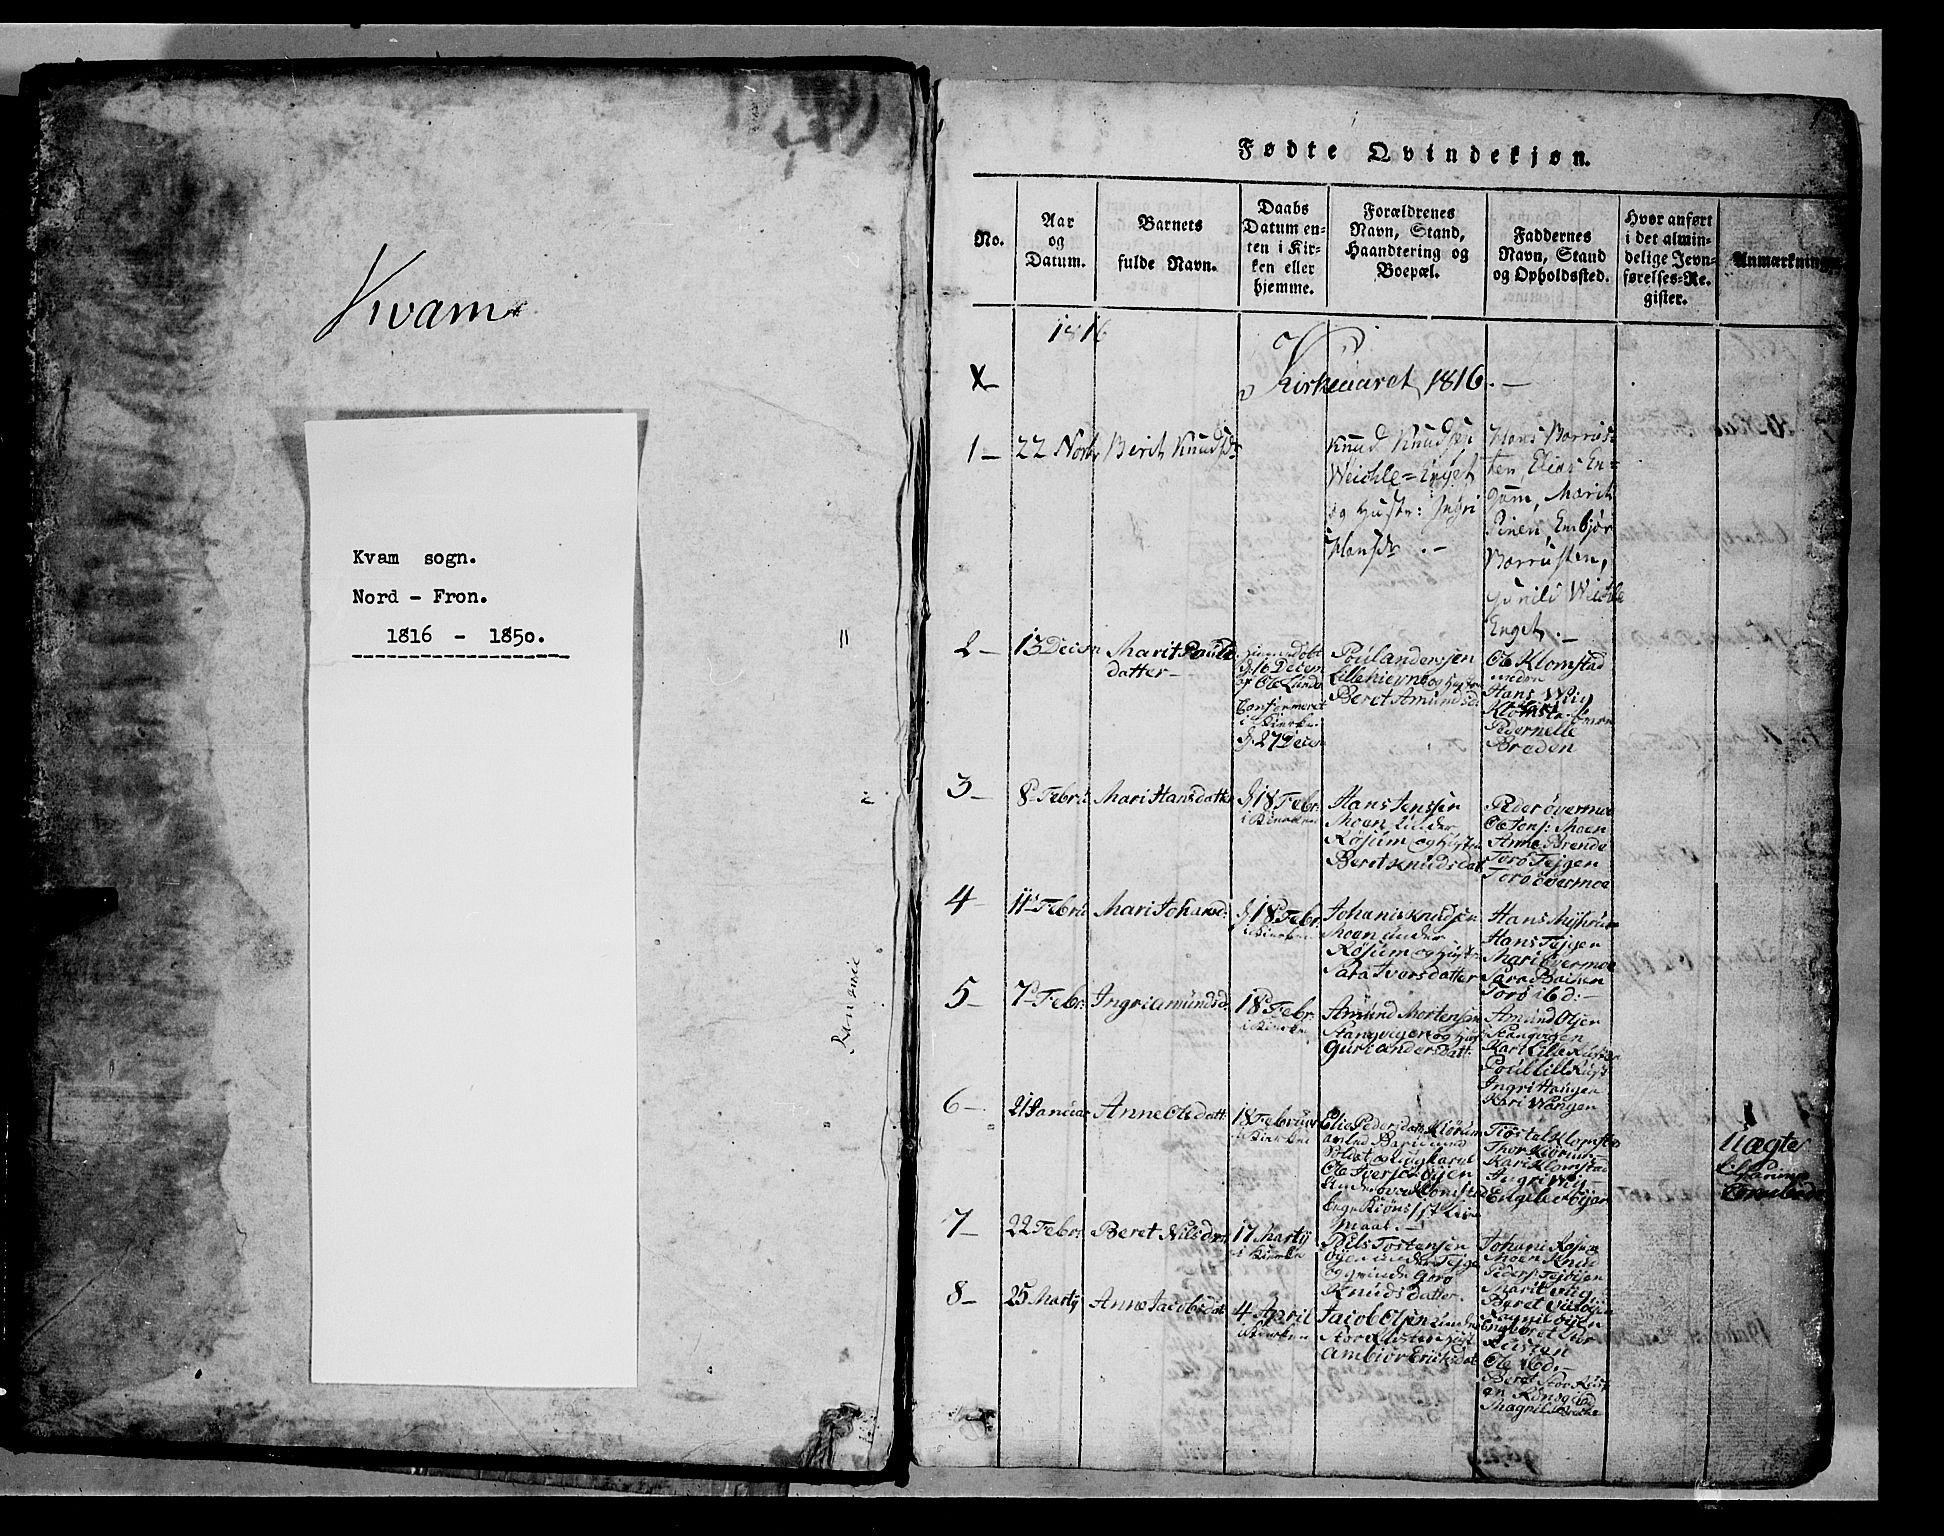 SAH, Fron prestekontor, H/Ha/Hab/L0002: Klokkerbok nr. 2, 1816-1850, s. 1